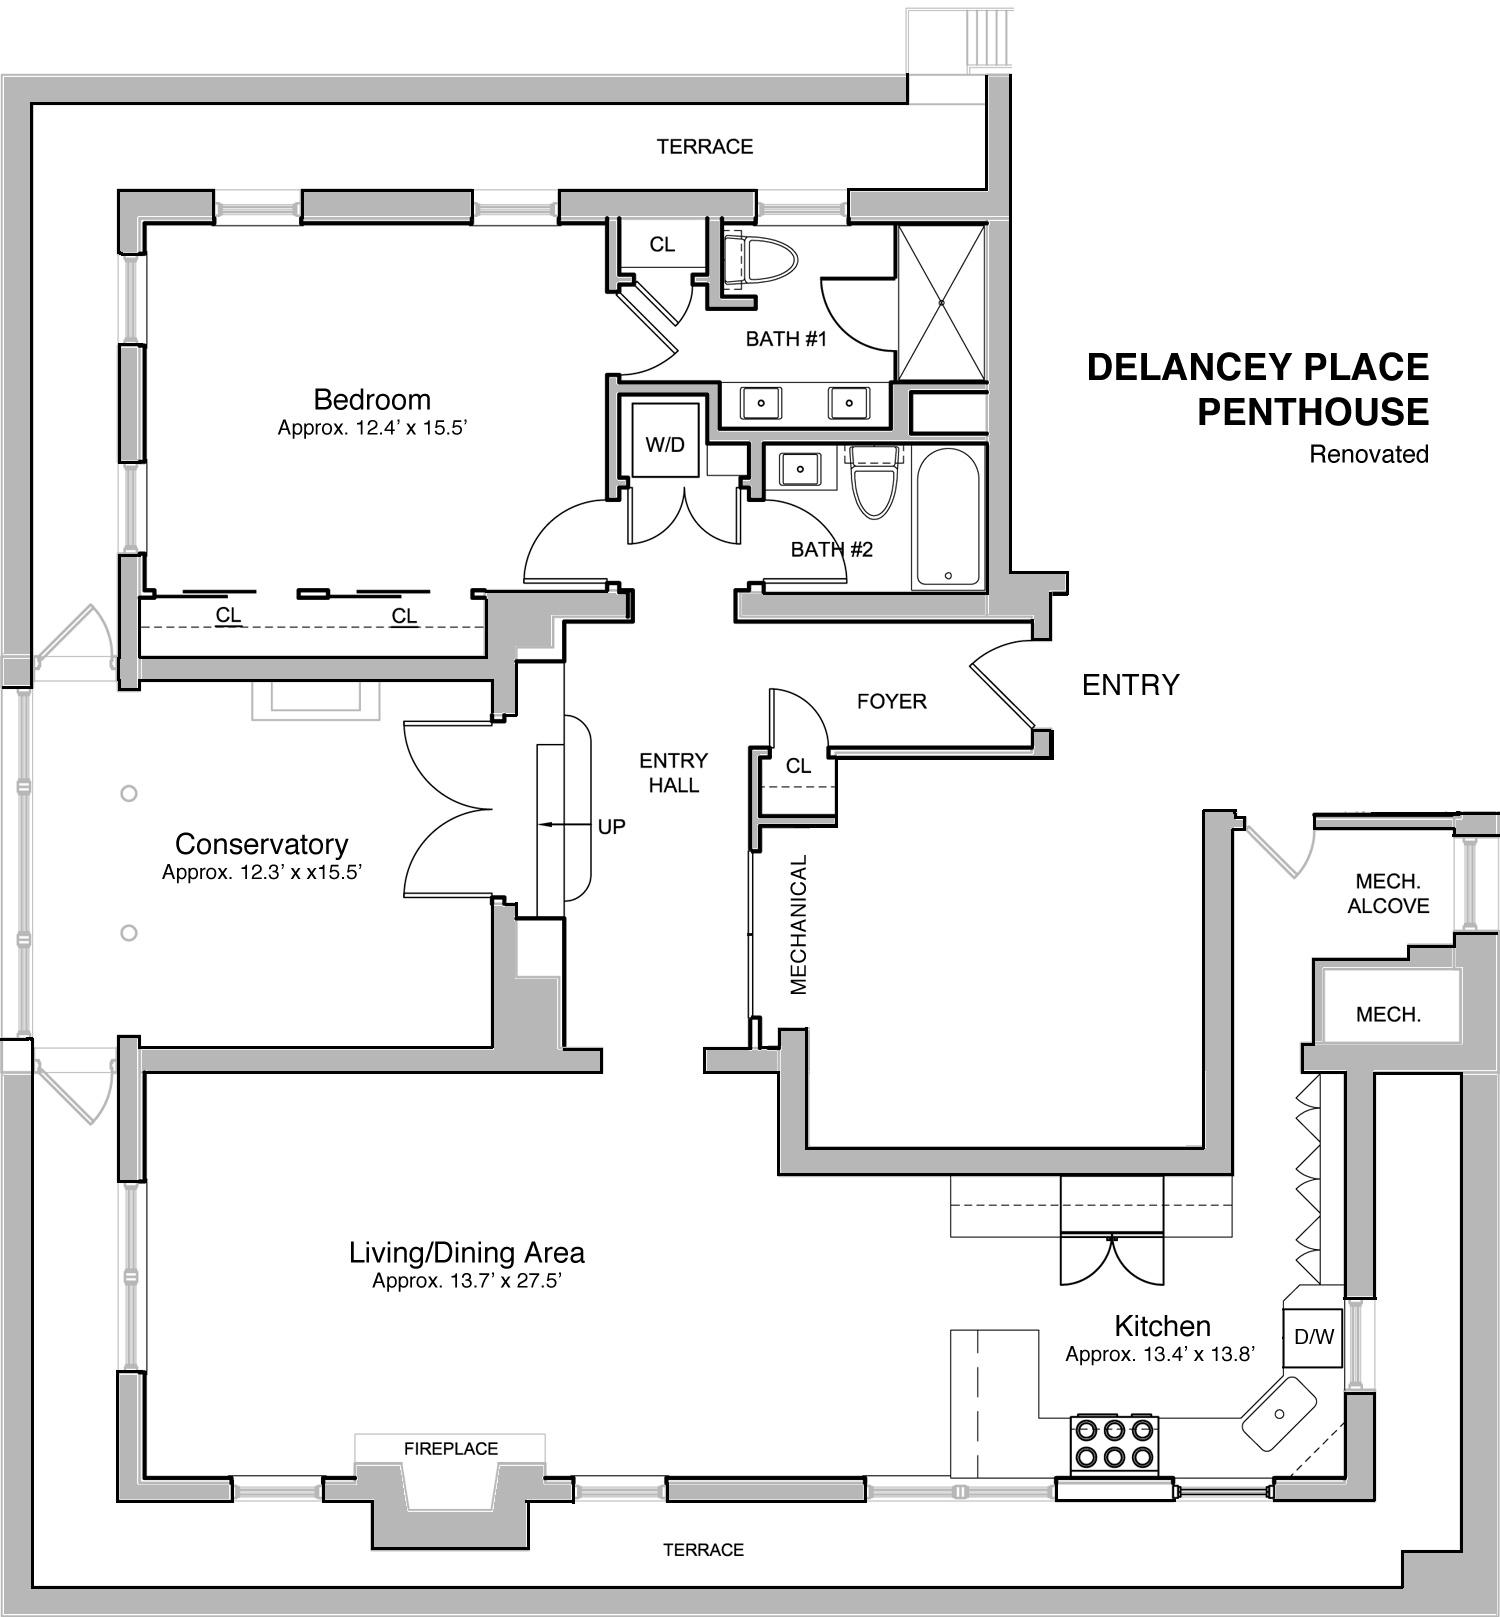 delancey place luxury apartments rittenhouse management corporation delancey penthouse floorplan